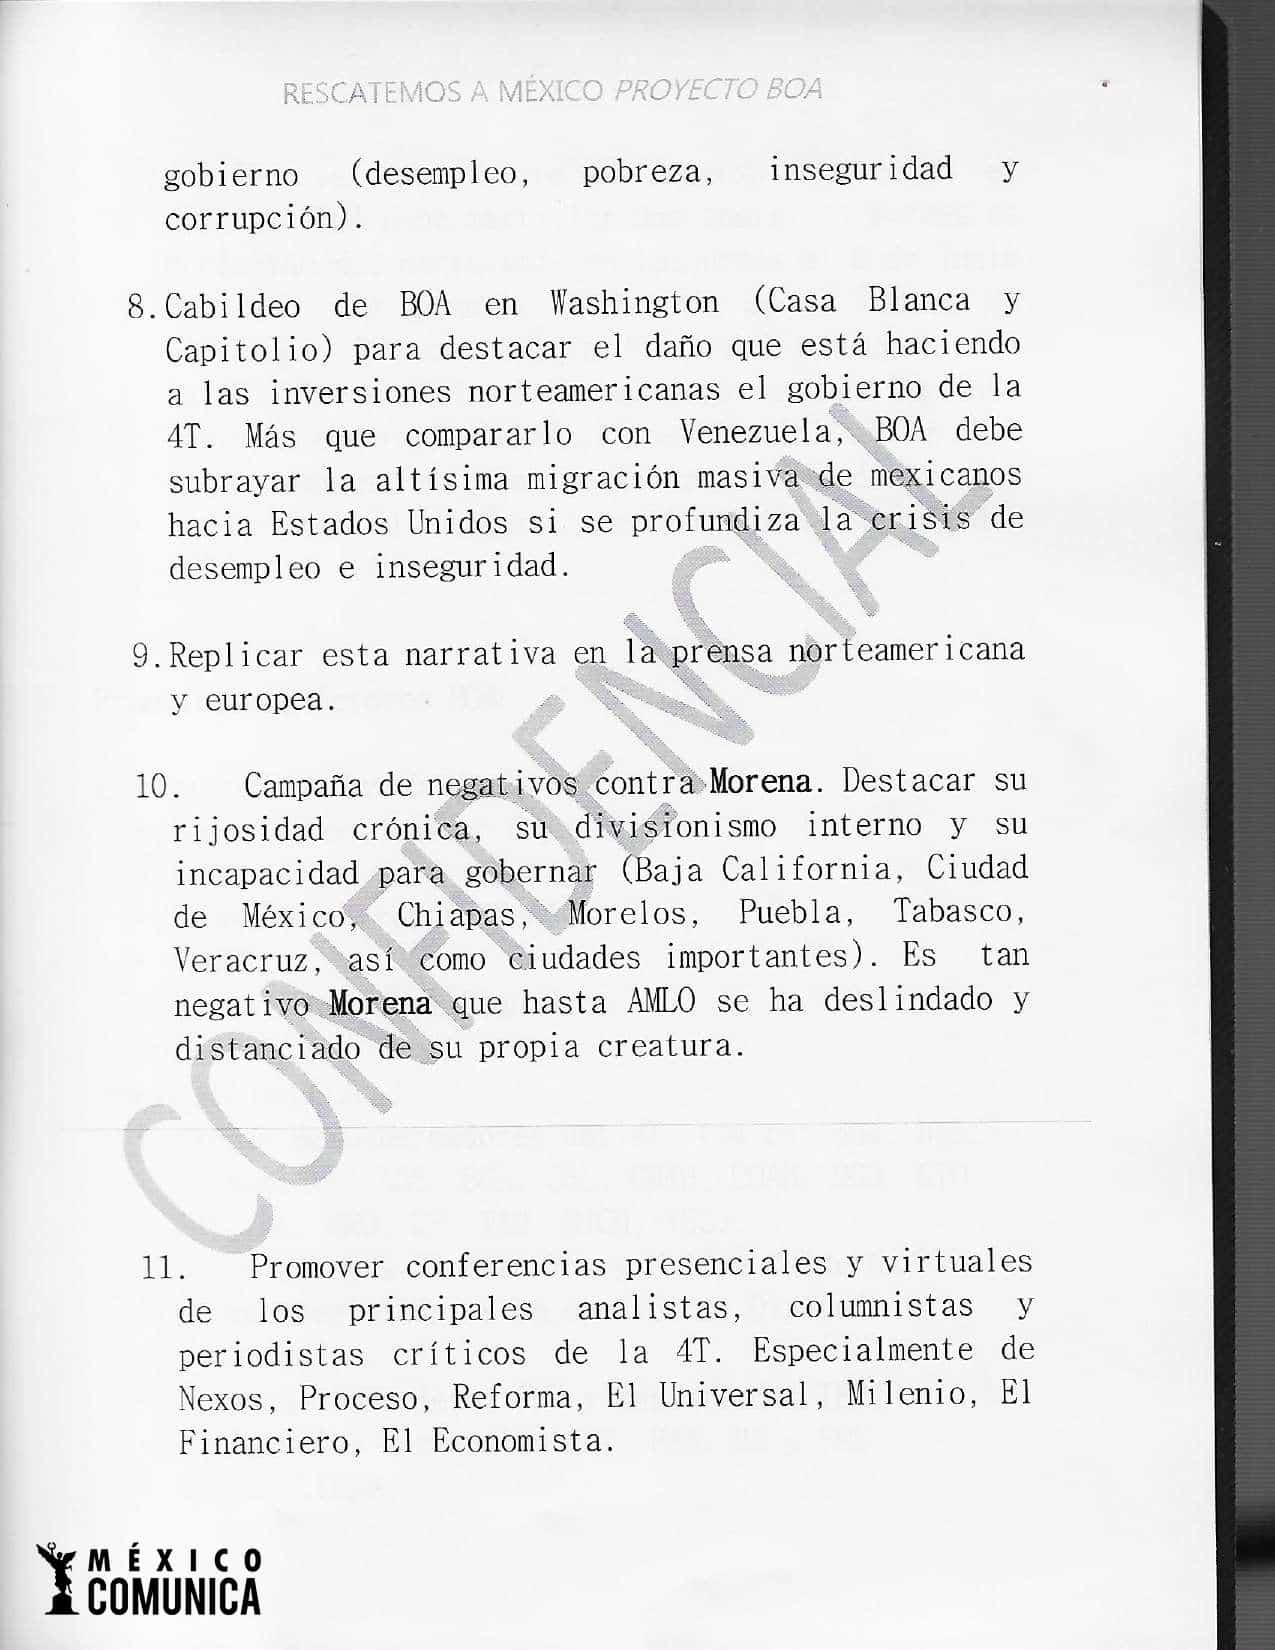 DocumentoRescatemosaMexico5